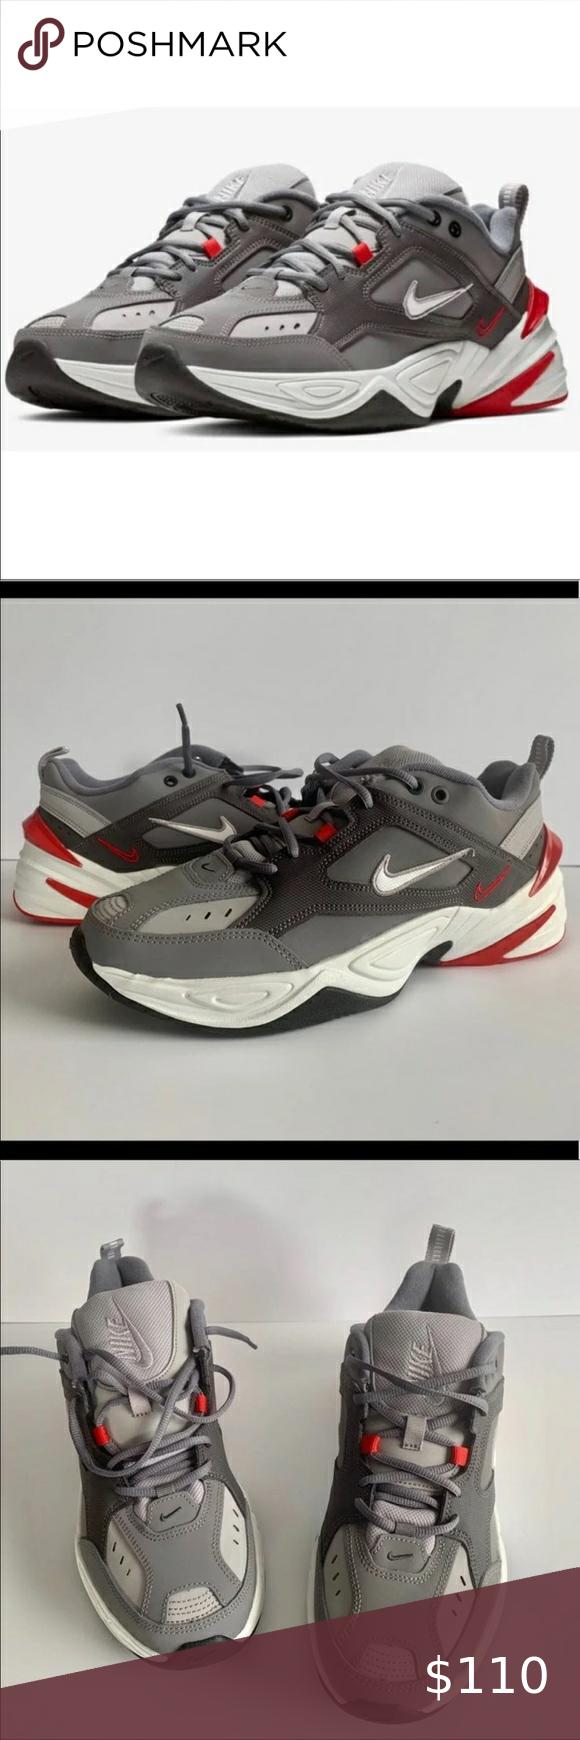 Nike M2k Tekno Gunsmoke Red Nike Shoes Nike Red Nike